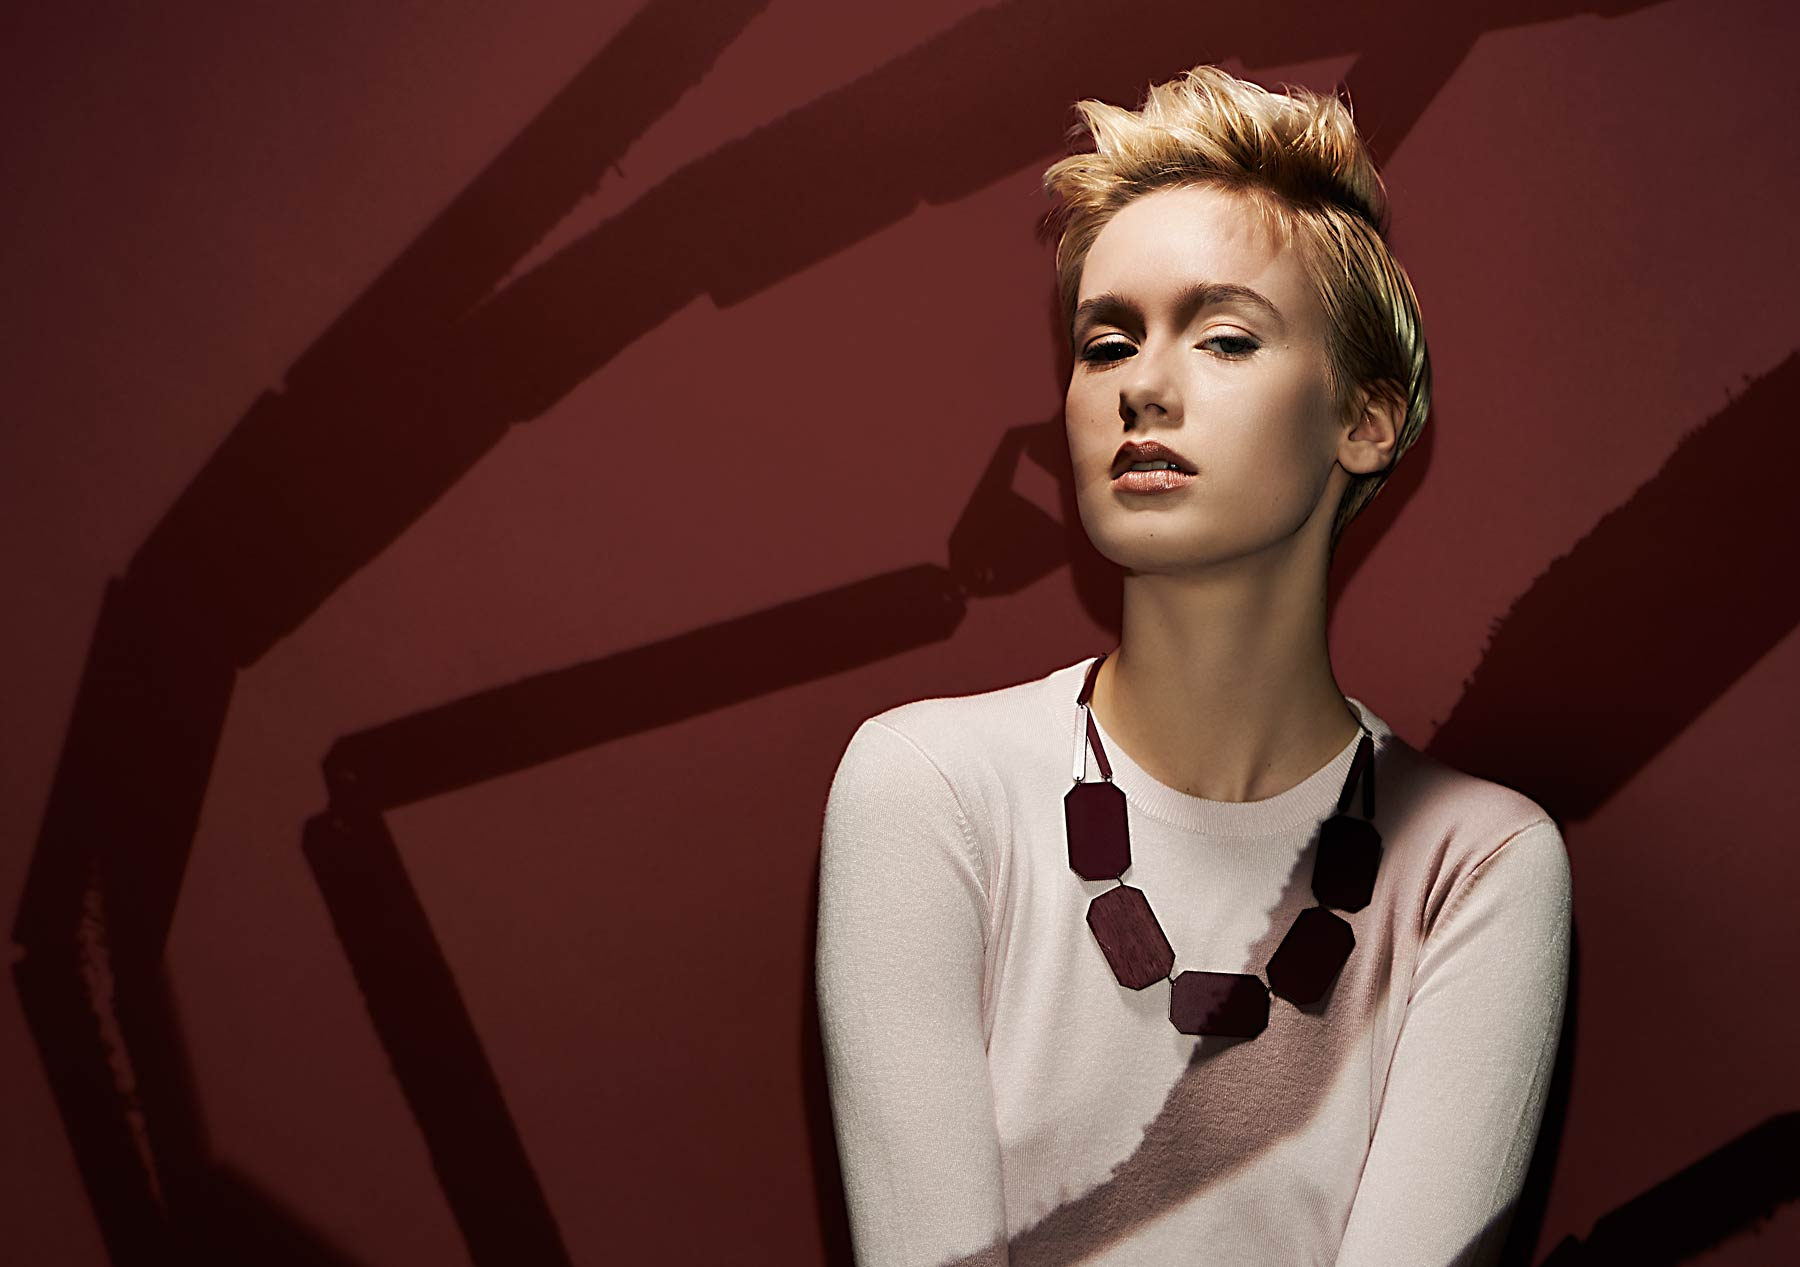 Maren Duesel 2014-03.07-people-jewellery-duesel6137